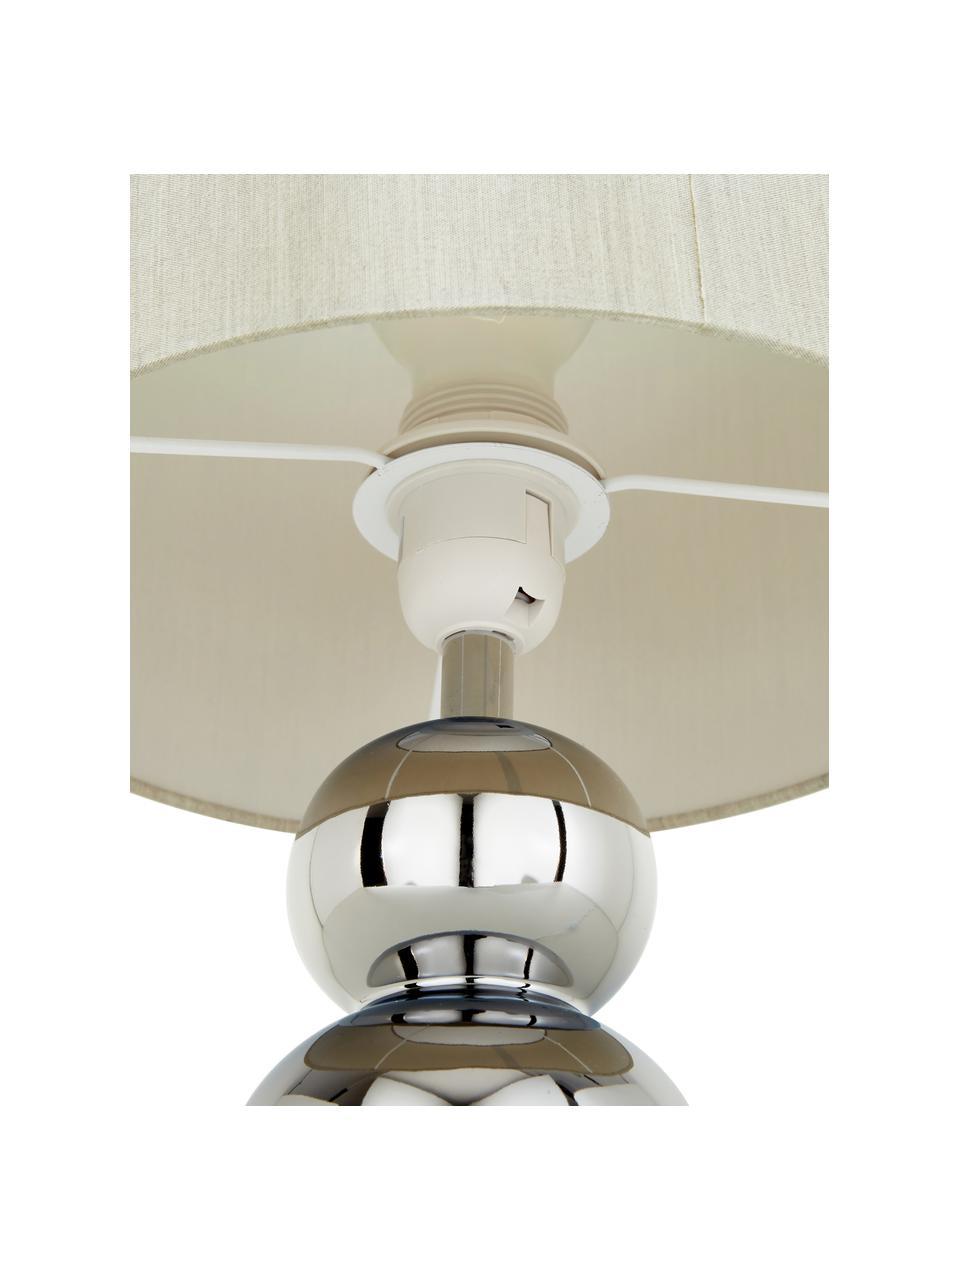 Lampada da tavolo in ceramica Regina, Paralume: tessuto, Base della lampada: ceramica, Taupe, cromo, Ø 25 x Alt. 49 cm